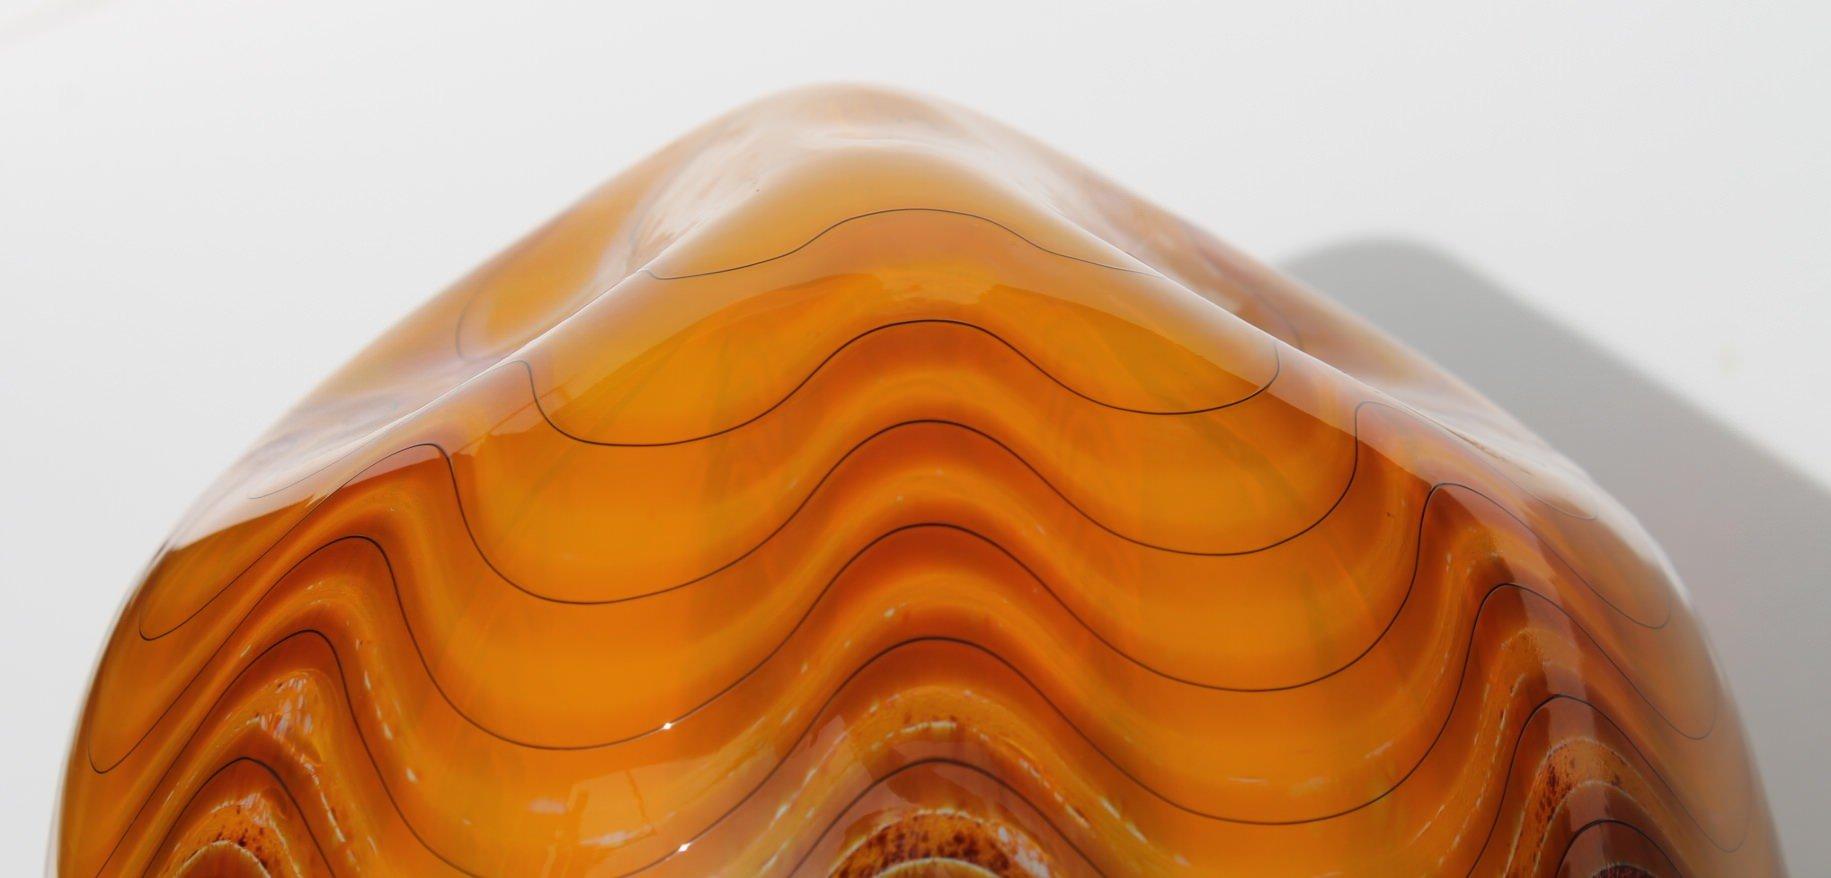 Cinnamon Macchia No. 388 by Dale Chihuly